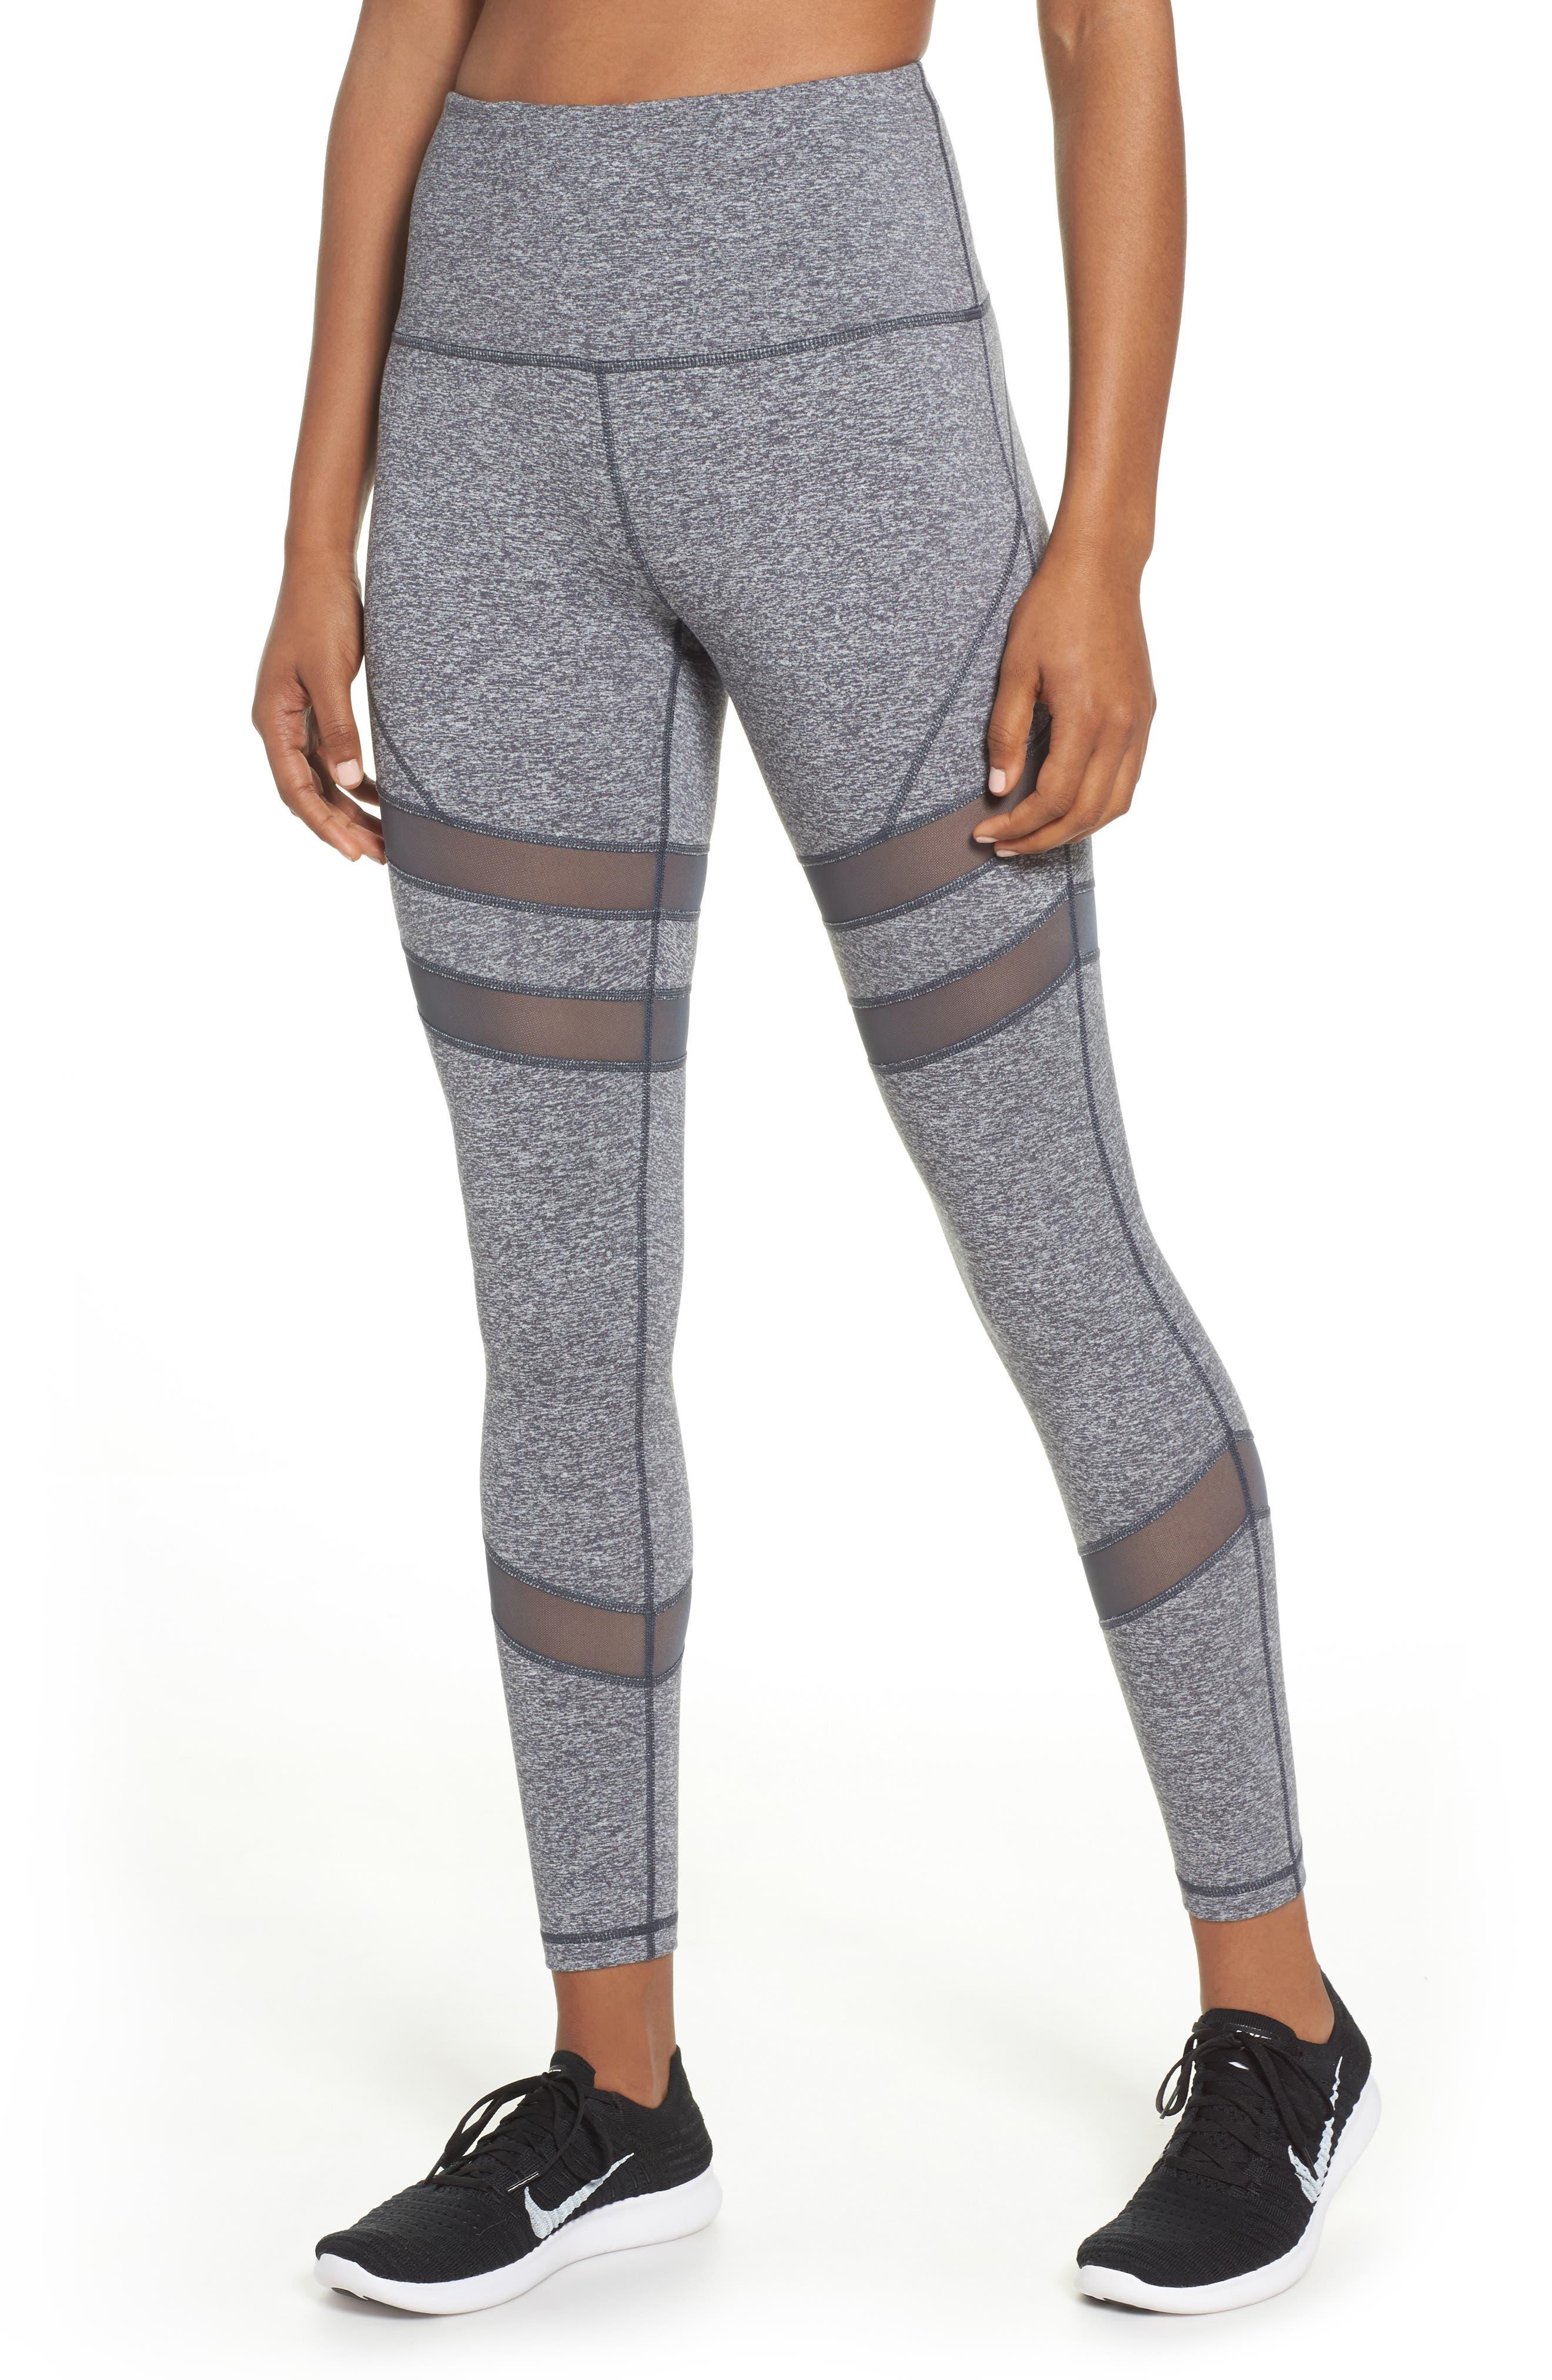 Good Sport High Waist Midi Leggings,                         Main,                         color, Grey Graphite Melange